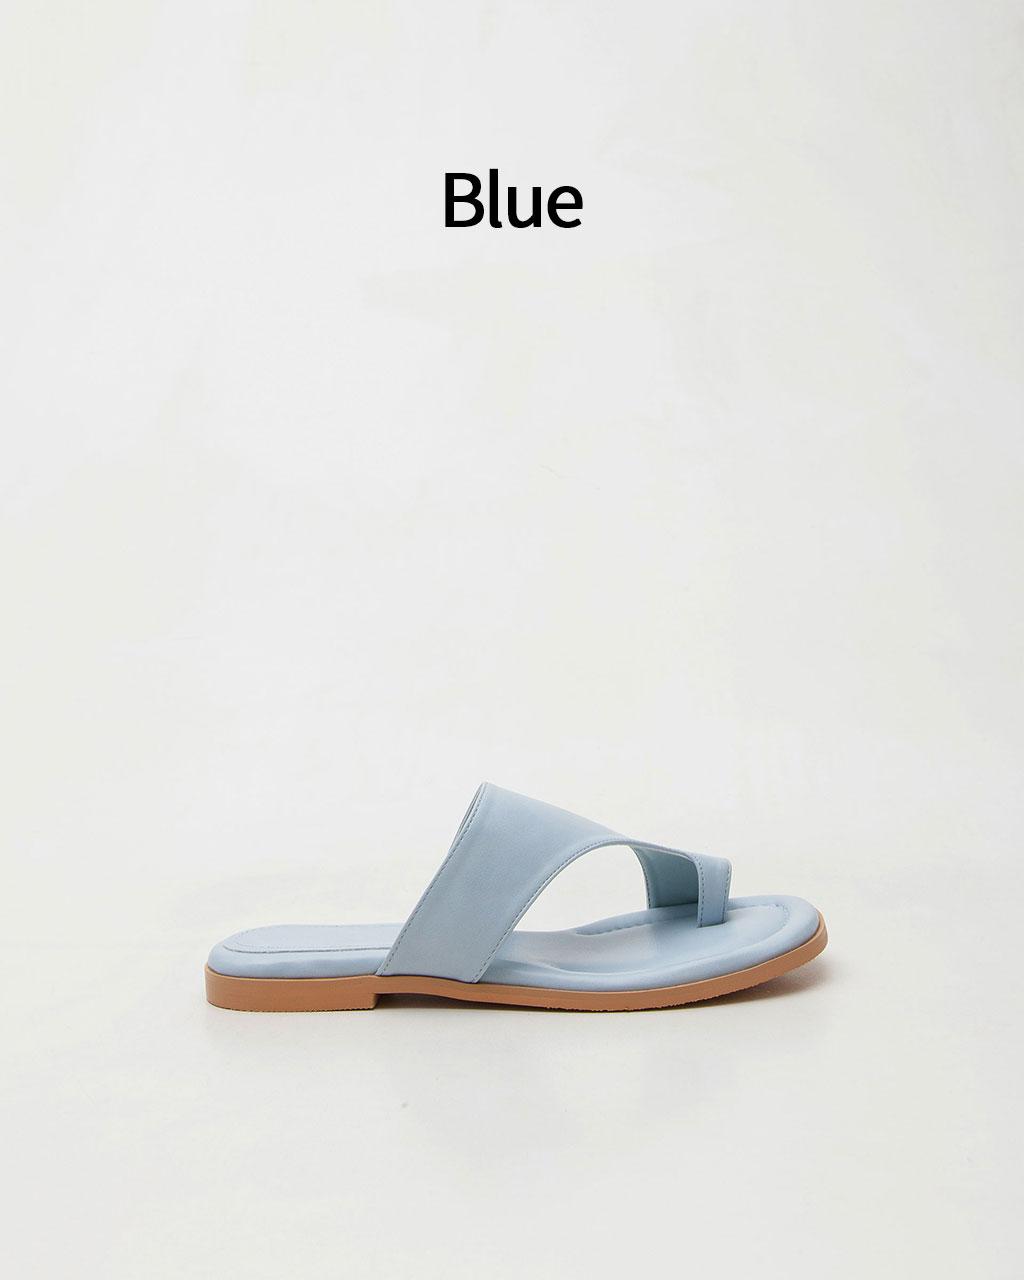 Tagtraume Mali - Blue(블루)